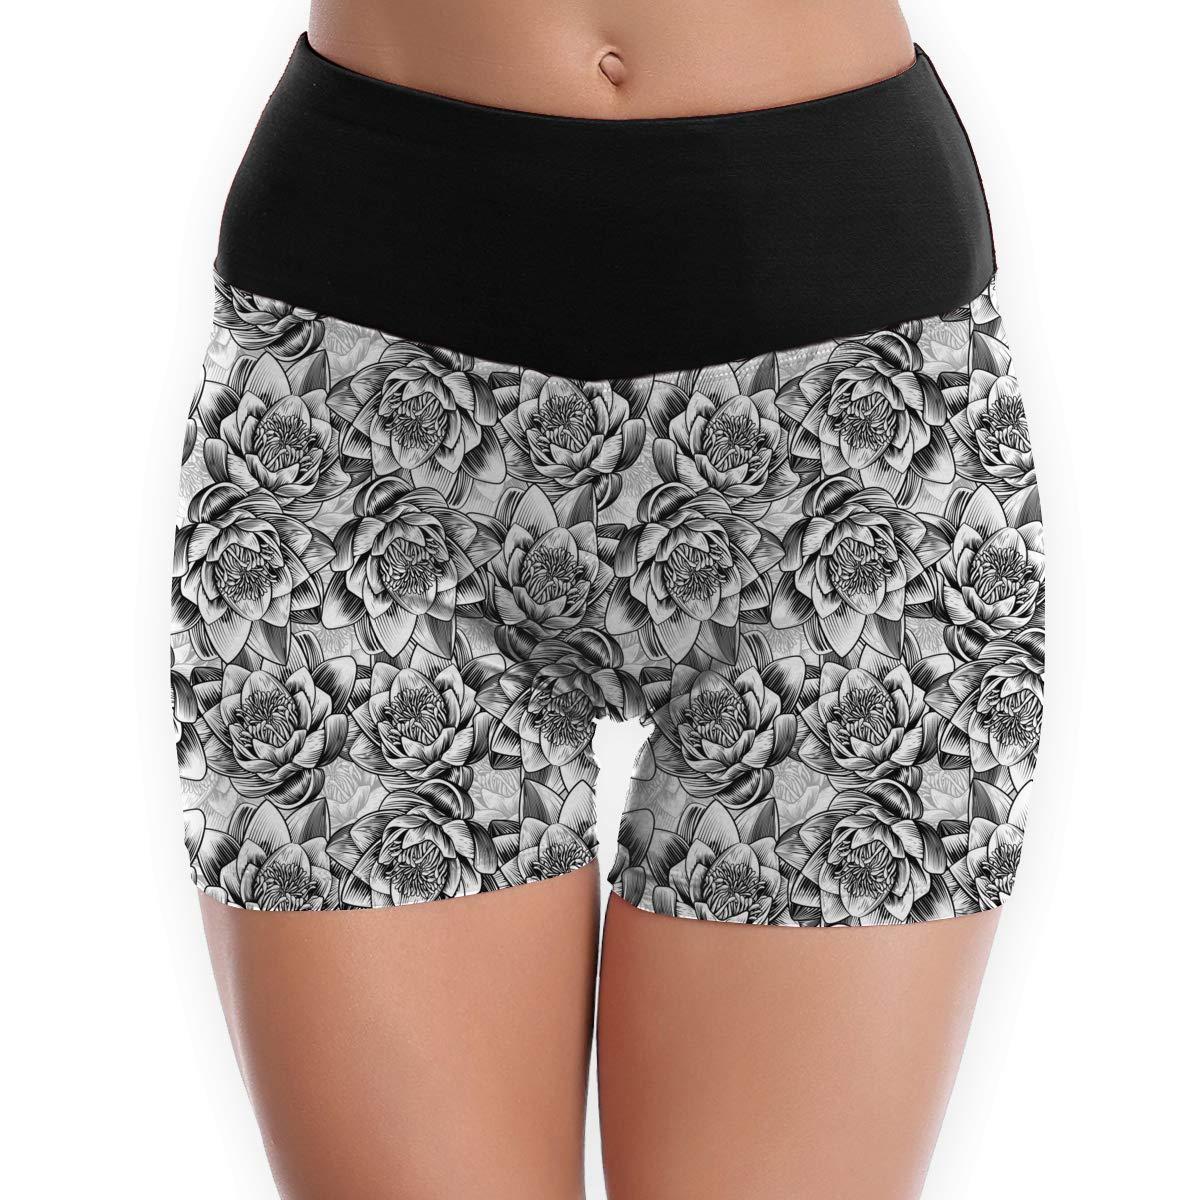 79781bbcae32d Amazon.com: Women's Water Lily Lotus Flower Pattern Power Flex Yoga Shorts  - Tummy Control Sports Leggings - S to XL: Clothing